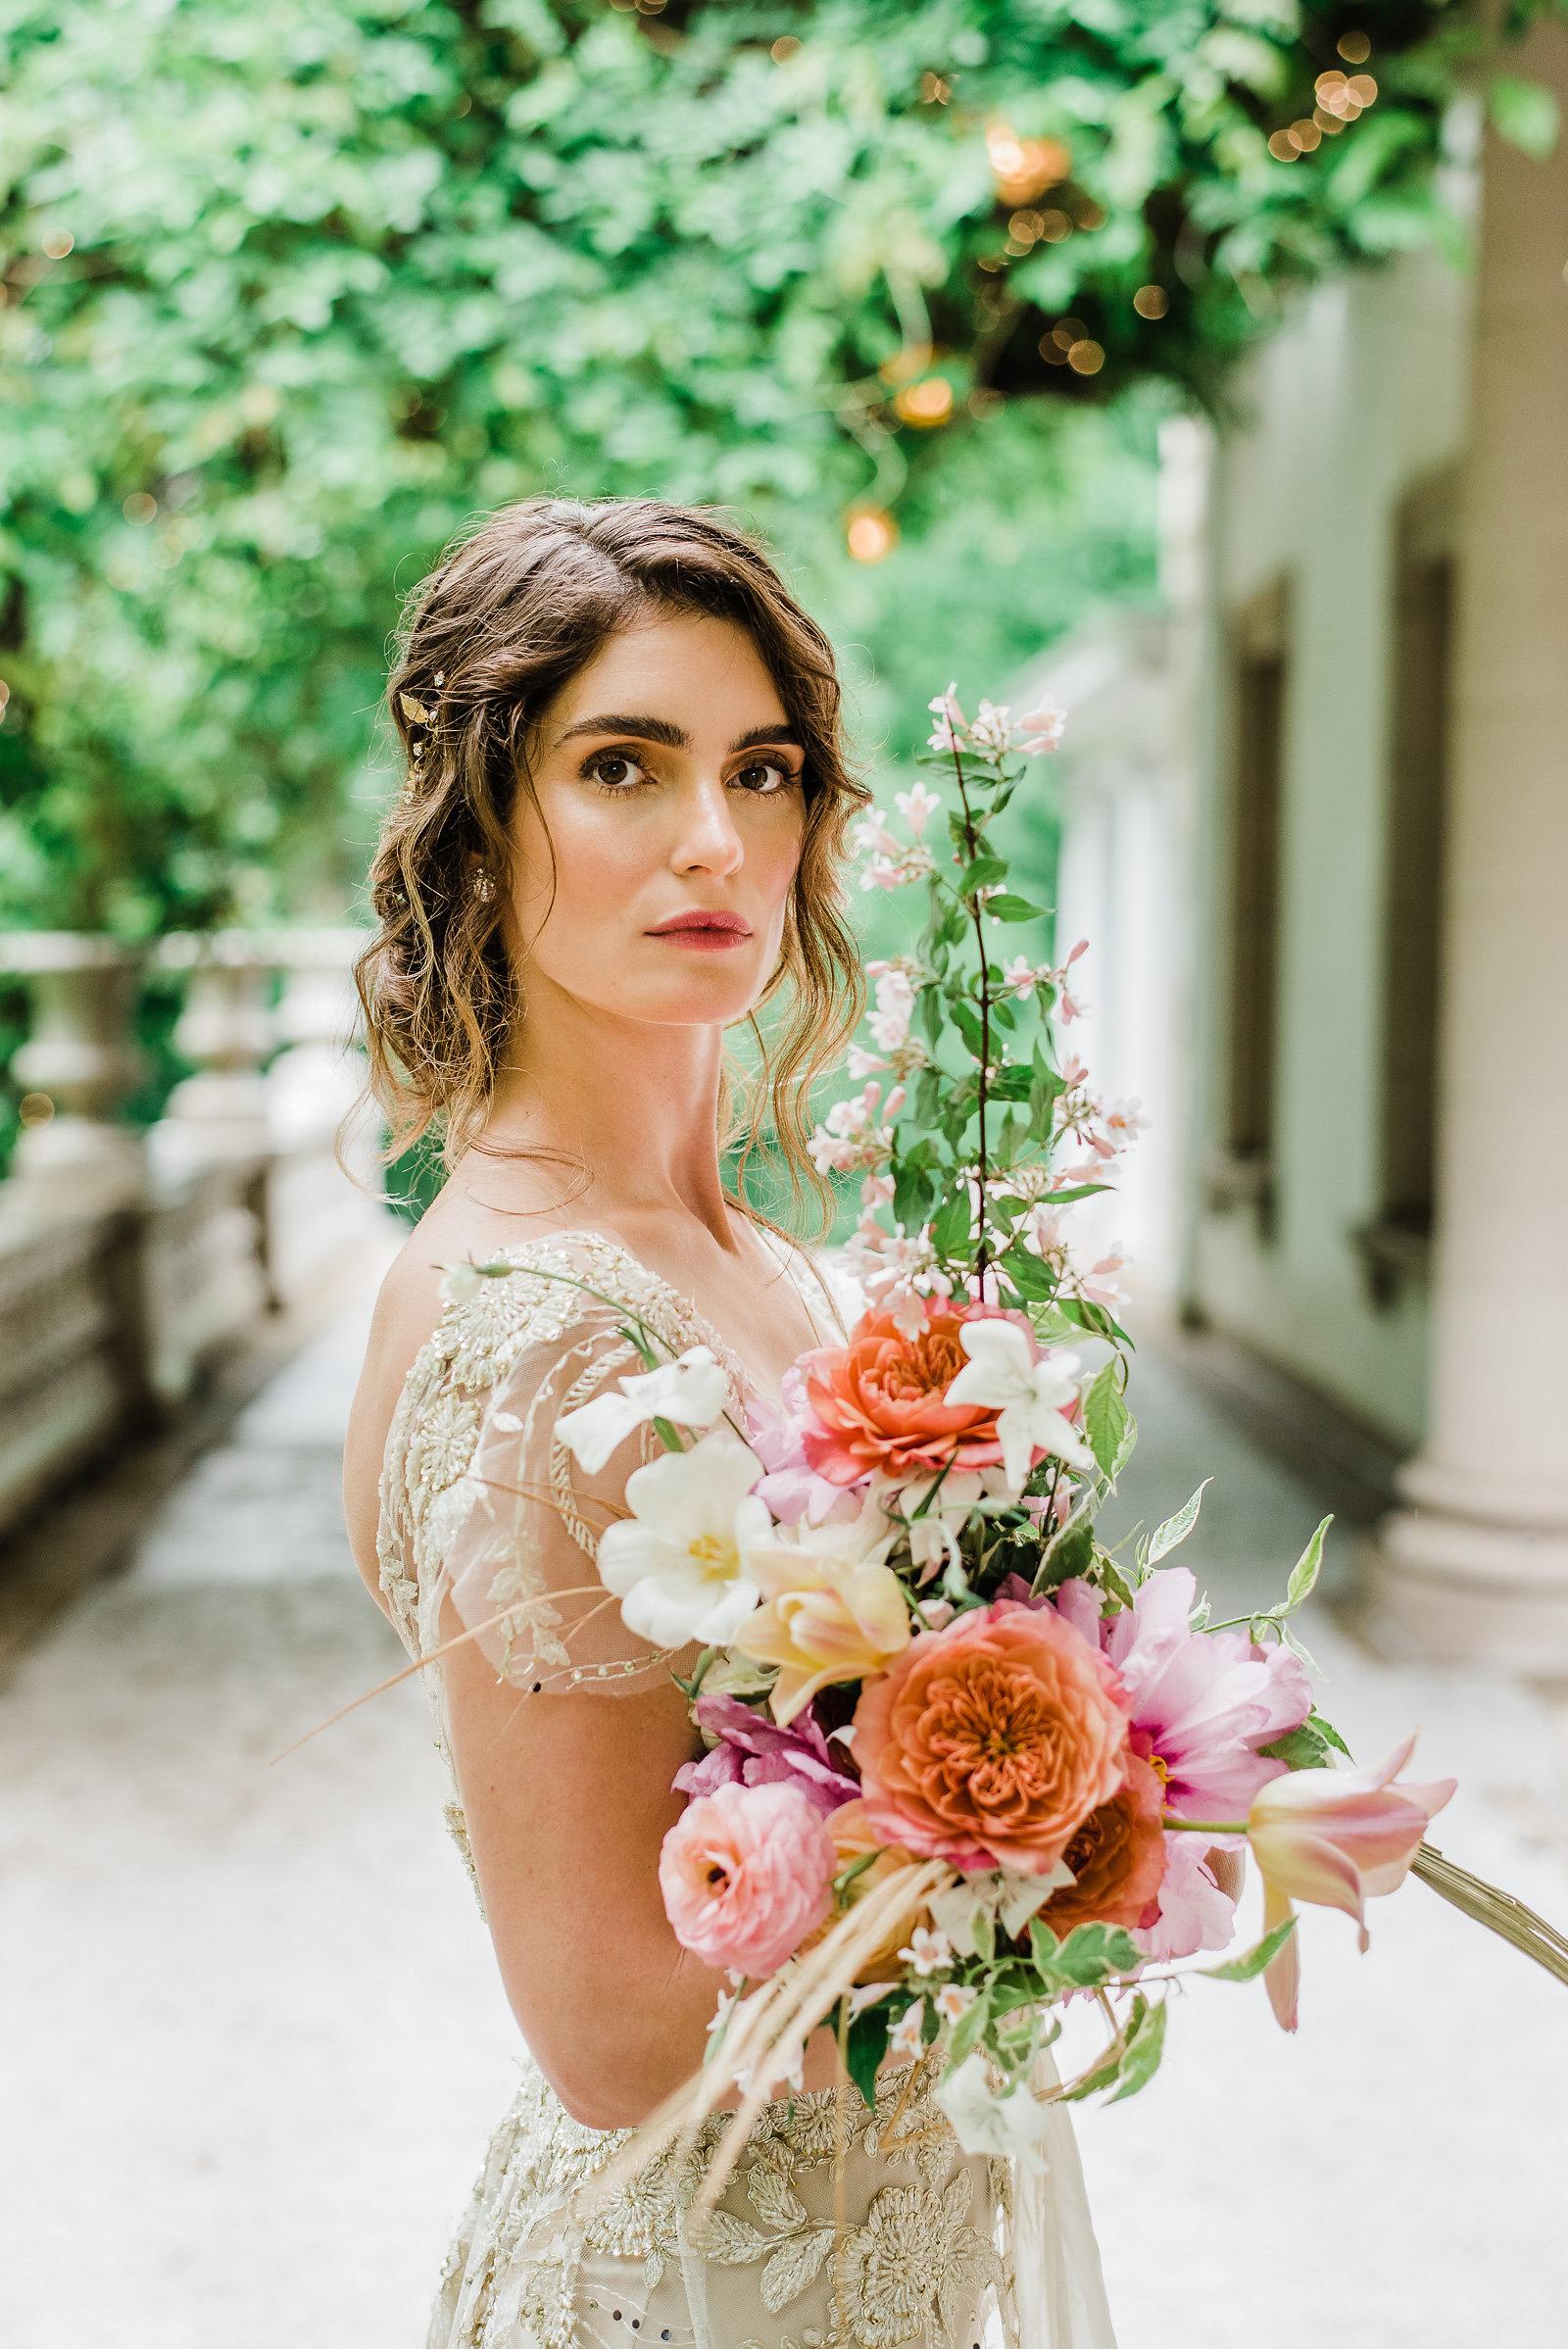 photography:  Megan Harris Photography     Florals:  Steelcut Flower Co.  -  @steelcutflowerco